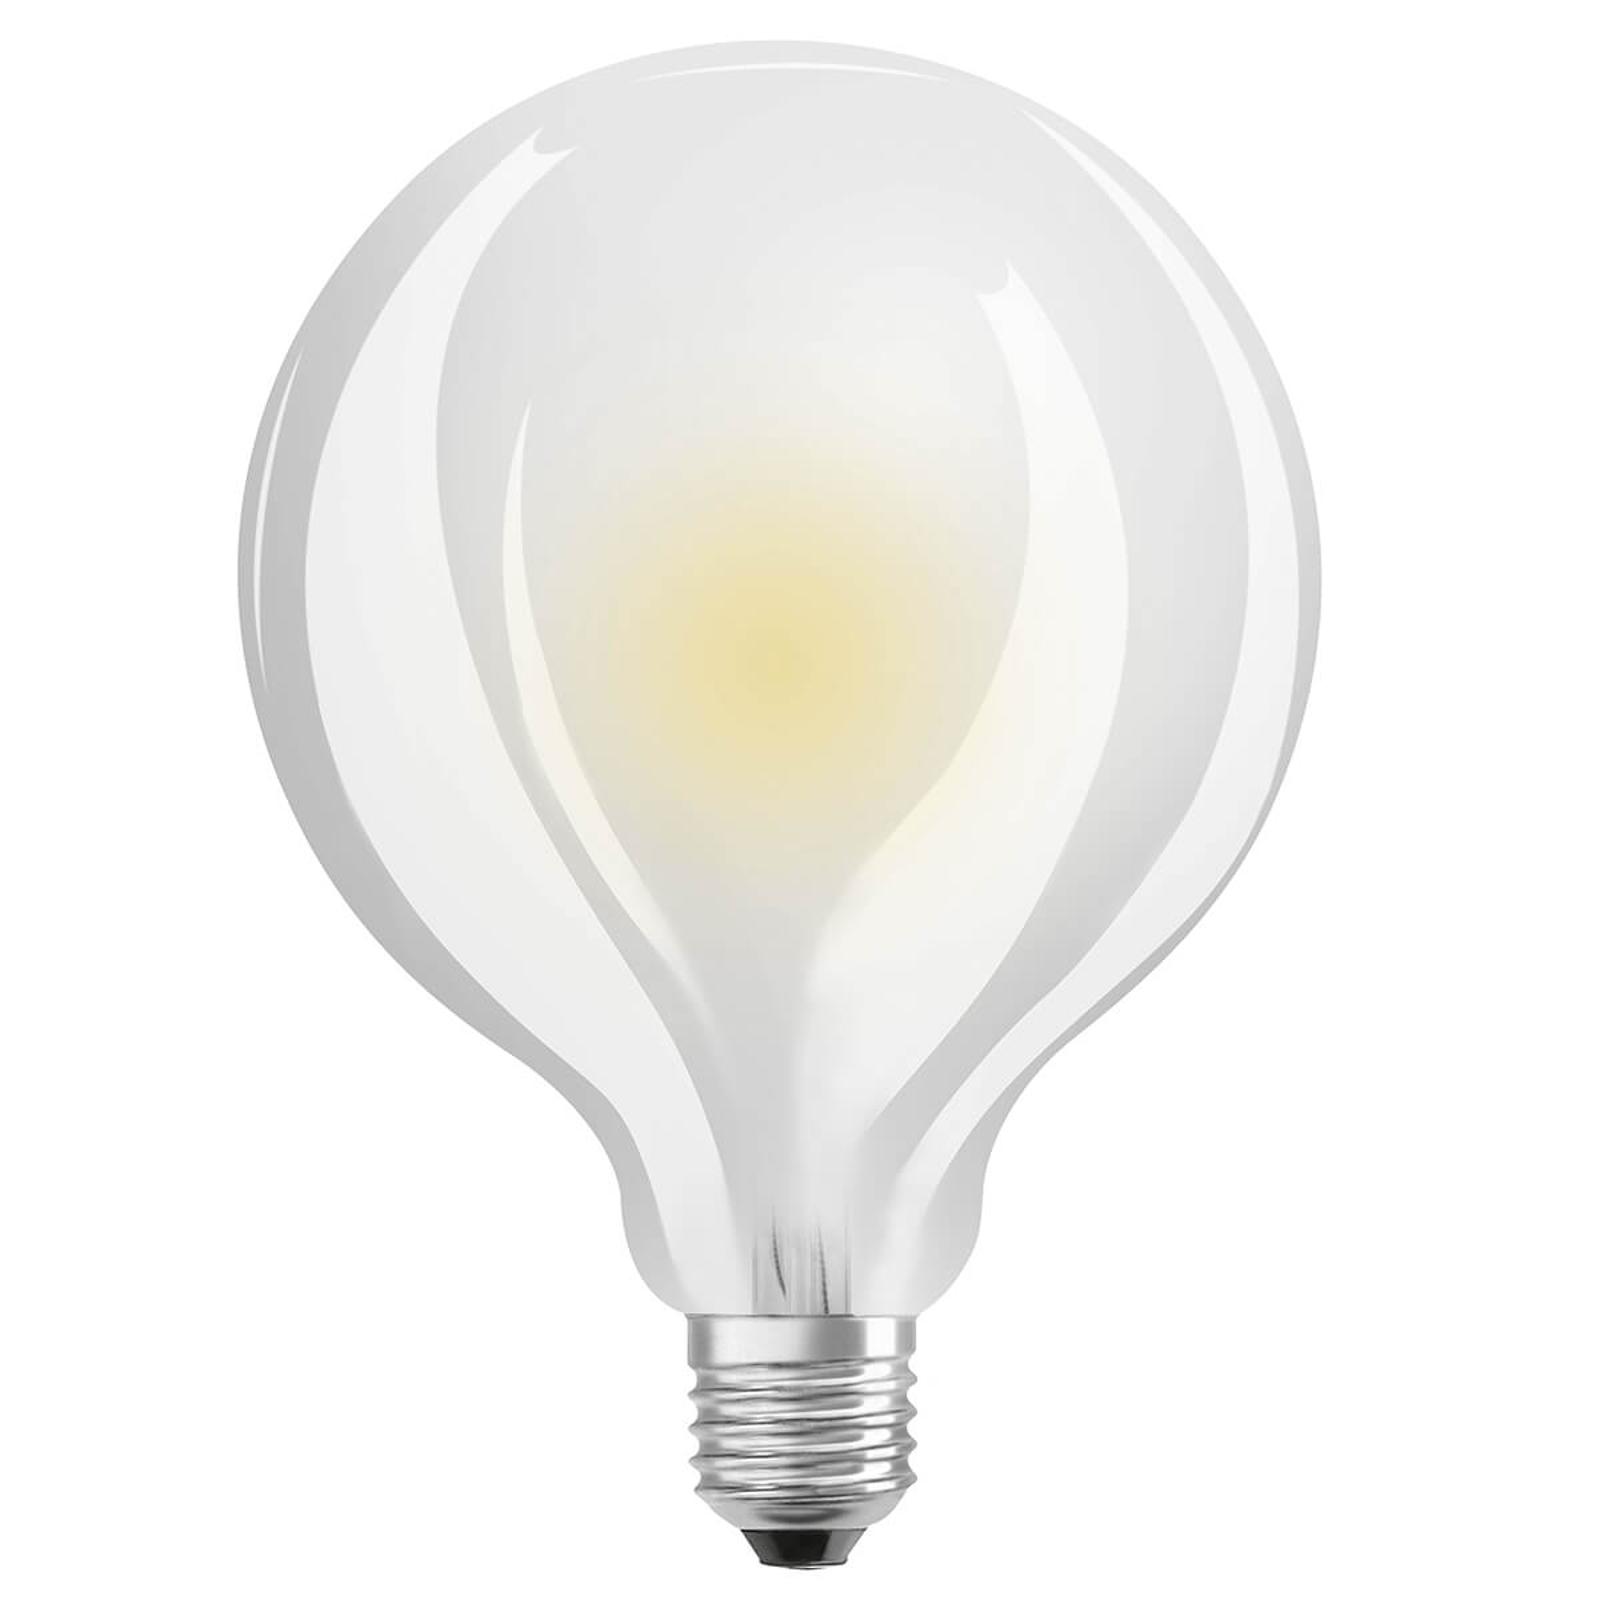 LED-Globelampe G95 E27 11,5W warmweiß 1.521 Lumen